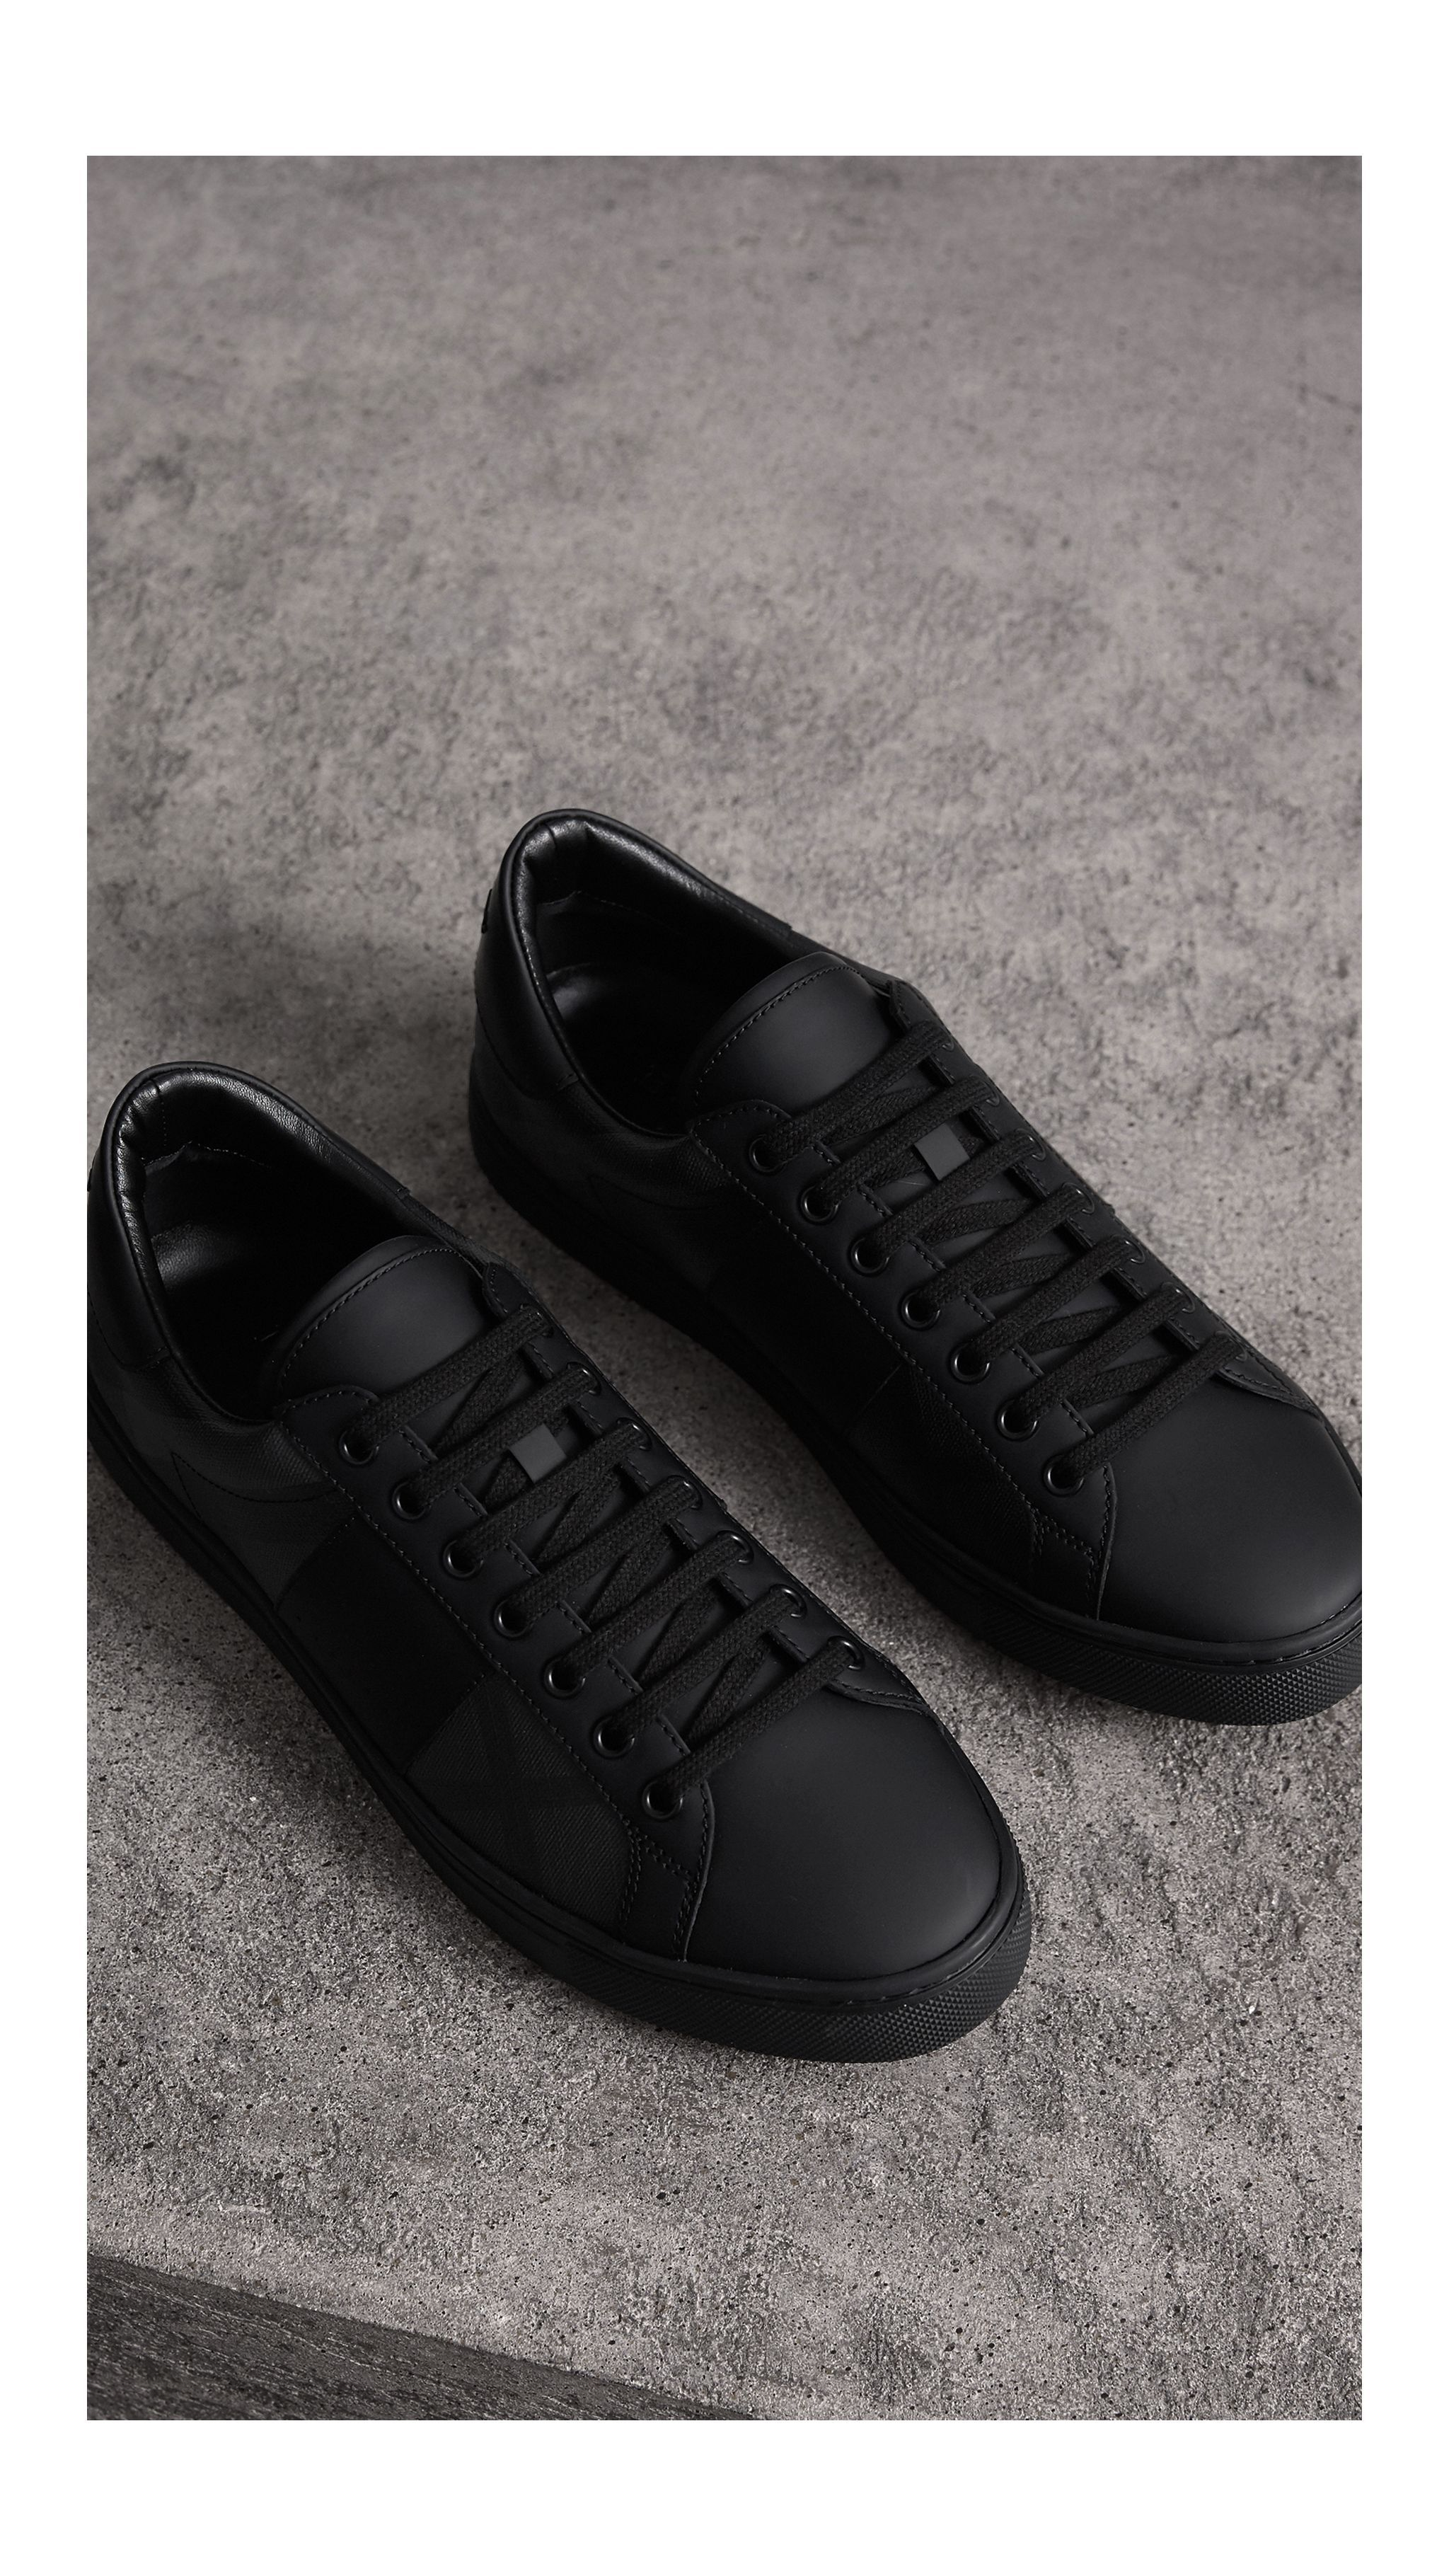 Gentleman shoes, Leather sneakers